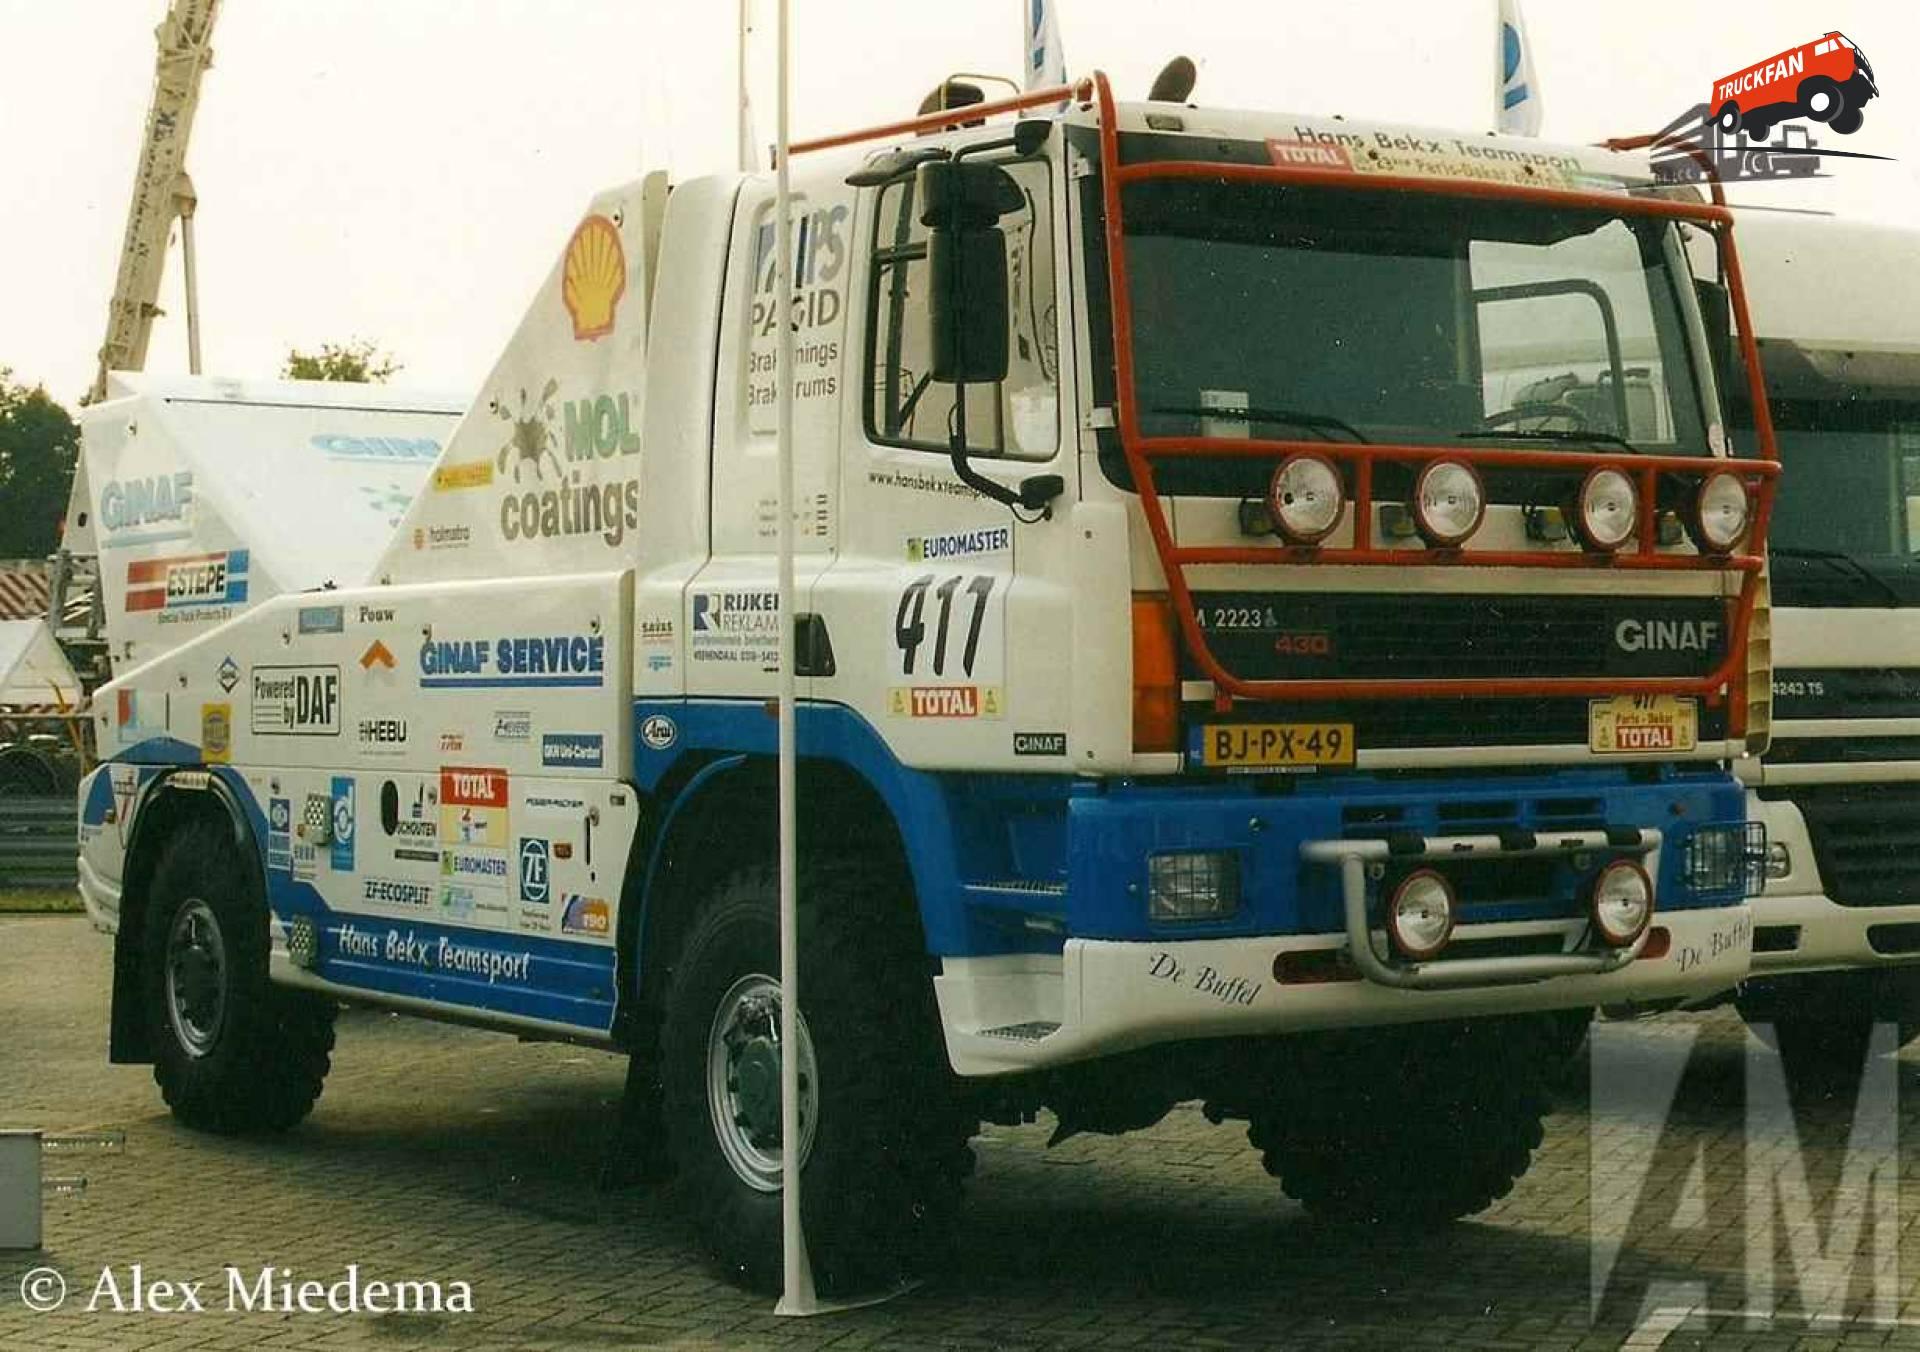 GINAF M2223